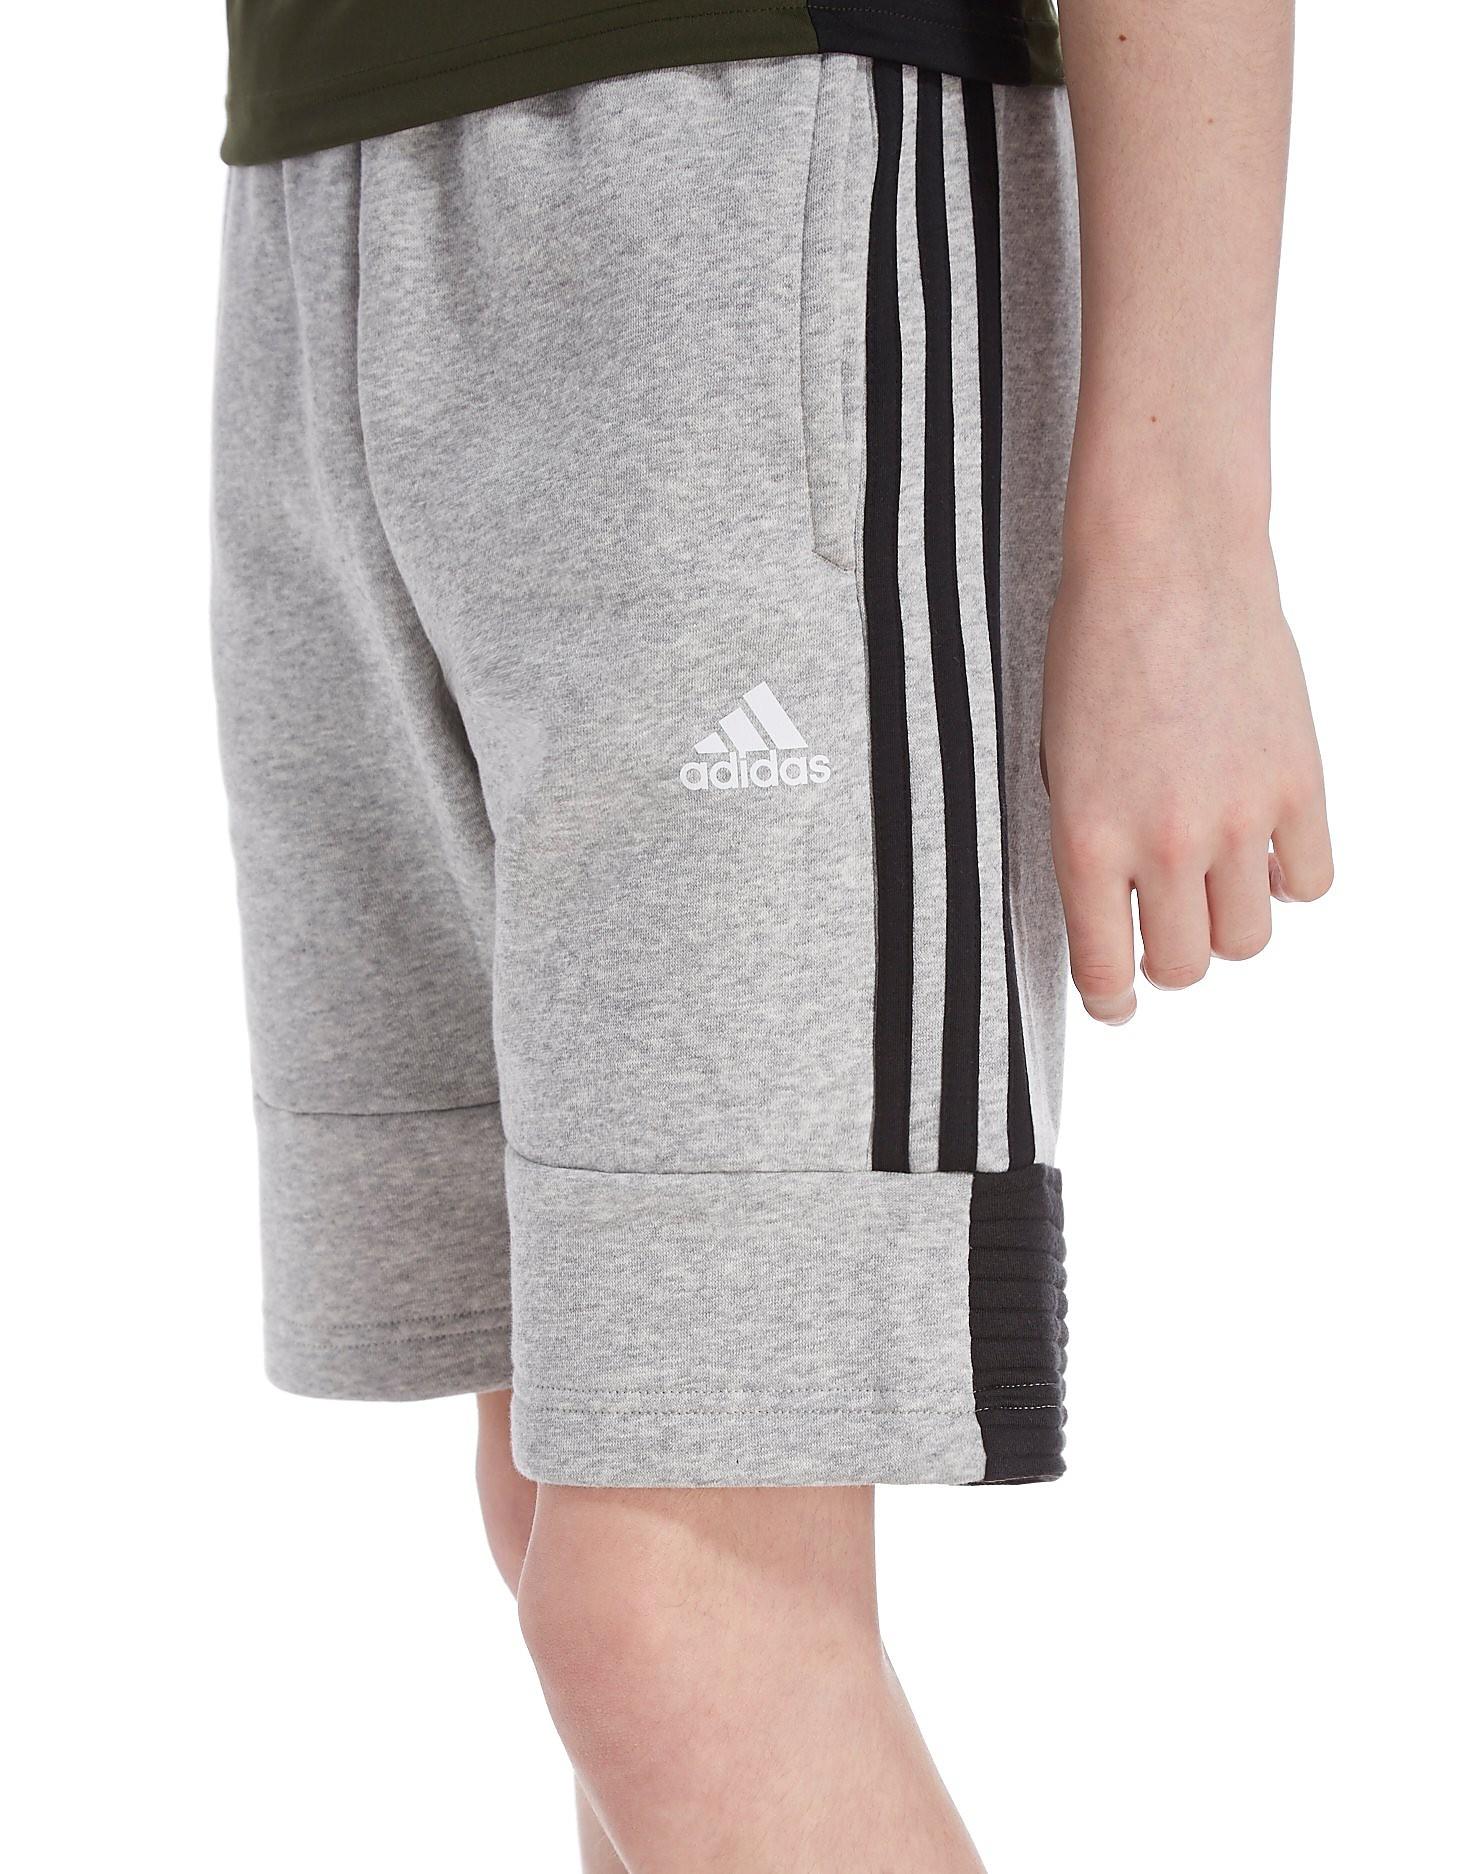 adidas Shorts Fleece SID - Grey/Black Kids Image